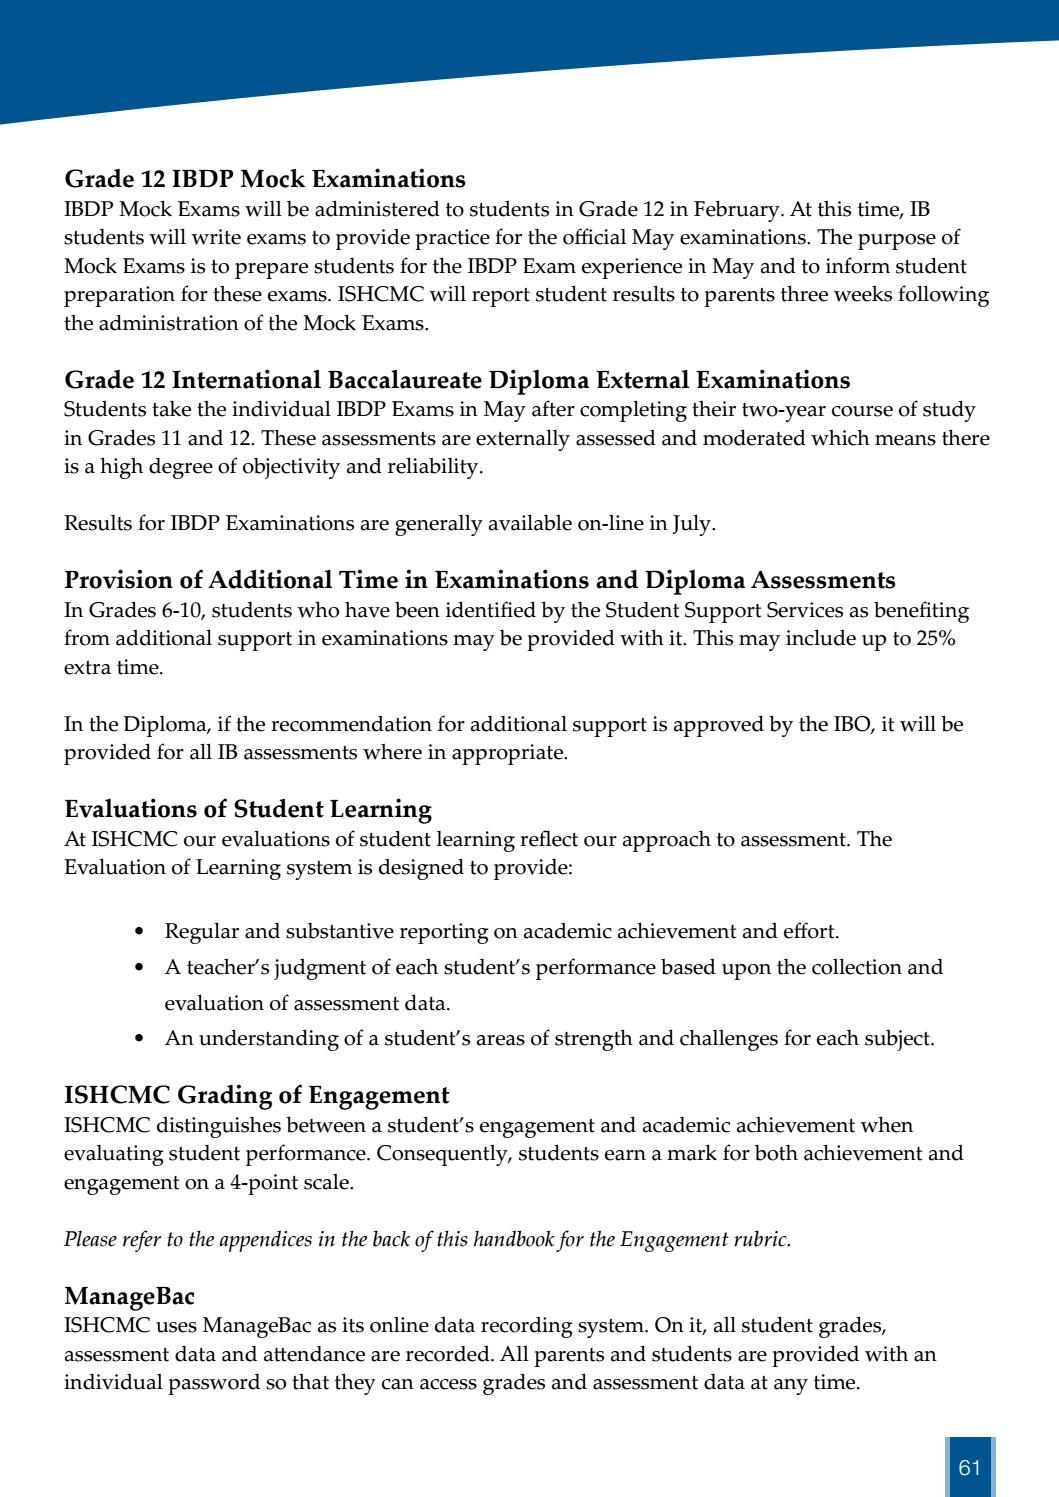 Secondary Student Parent Handbook 2016 - 2017 by ISHCMC - issuu